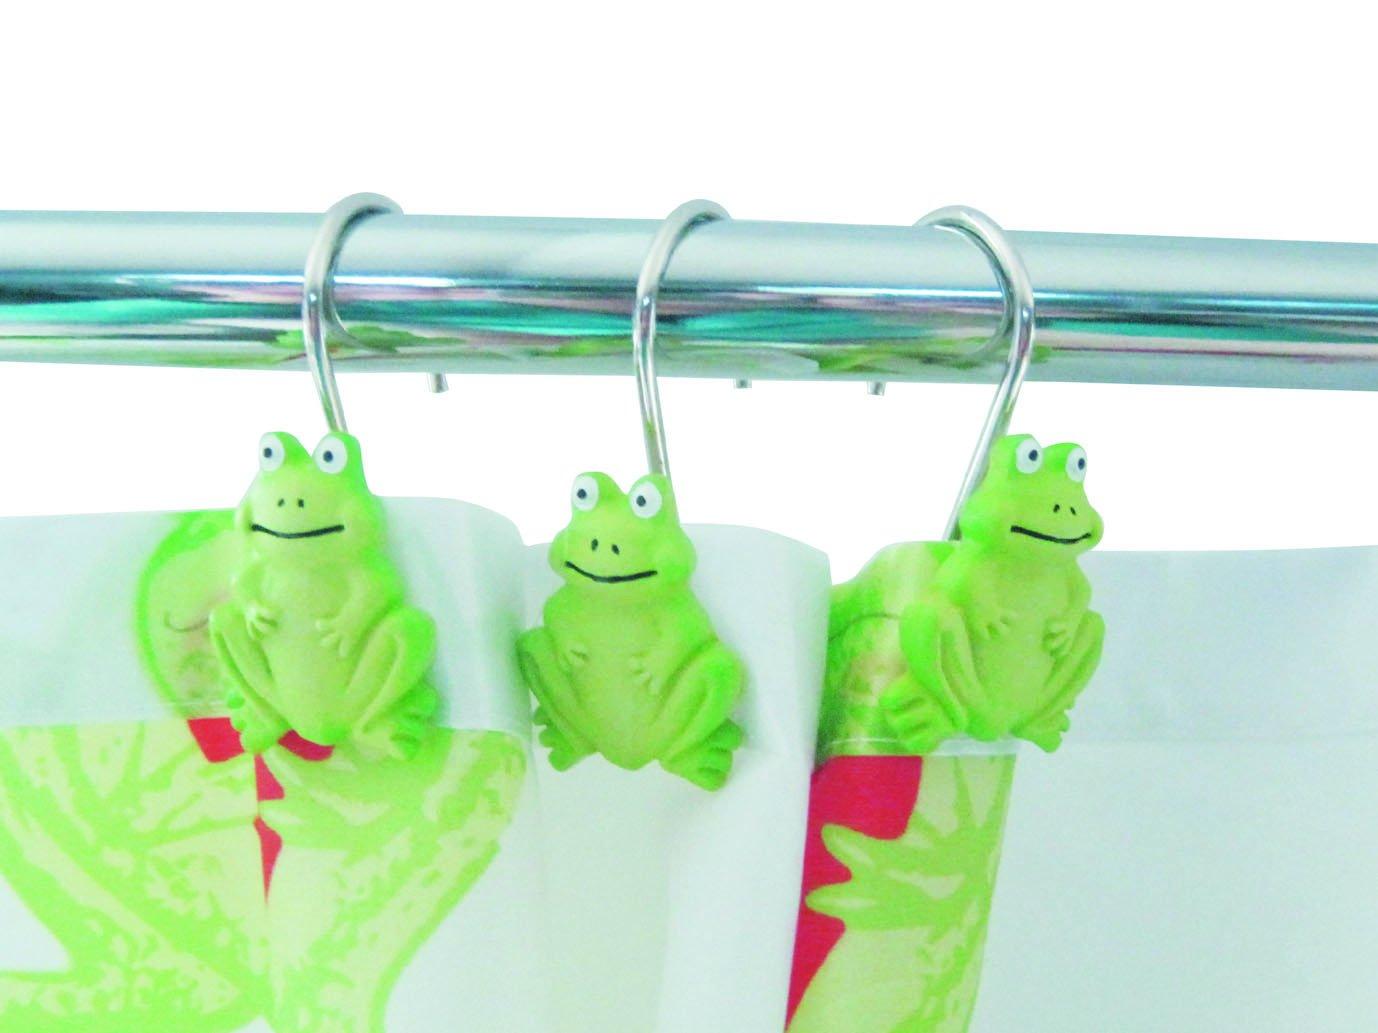 Frog bathroom set - Cheap Twofishes Green Frog Shape European Bathroom Shower Curtain Hook Curtain Rings Fashion Classic Home Design